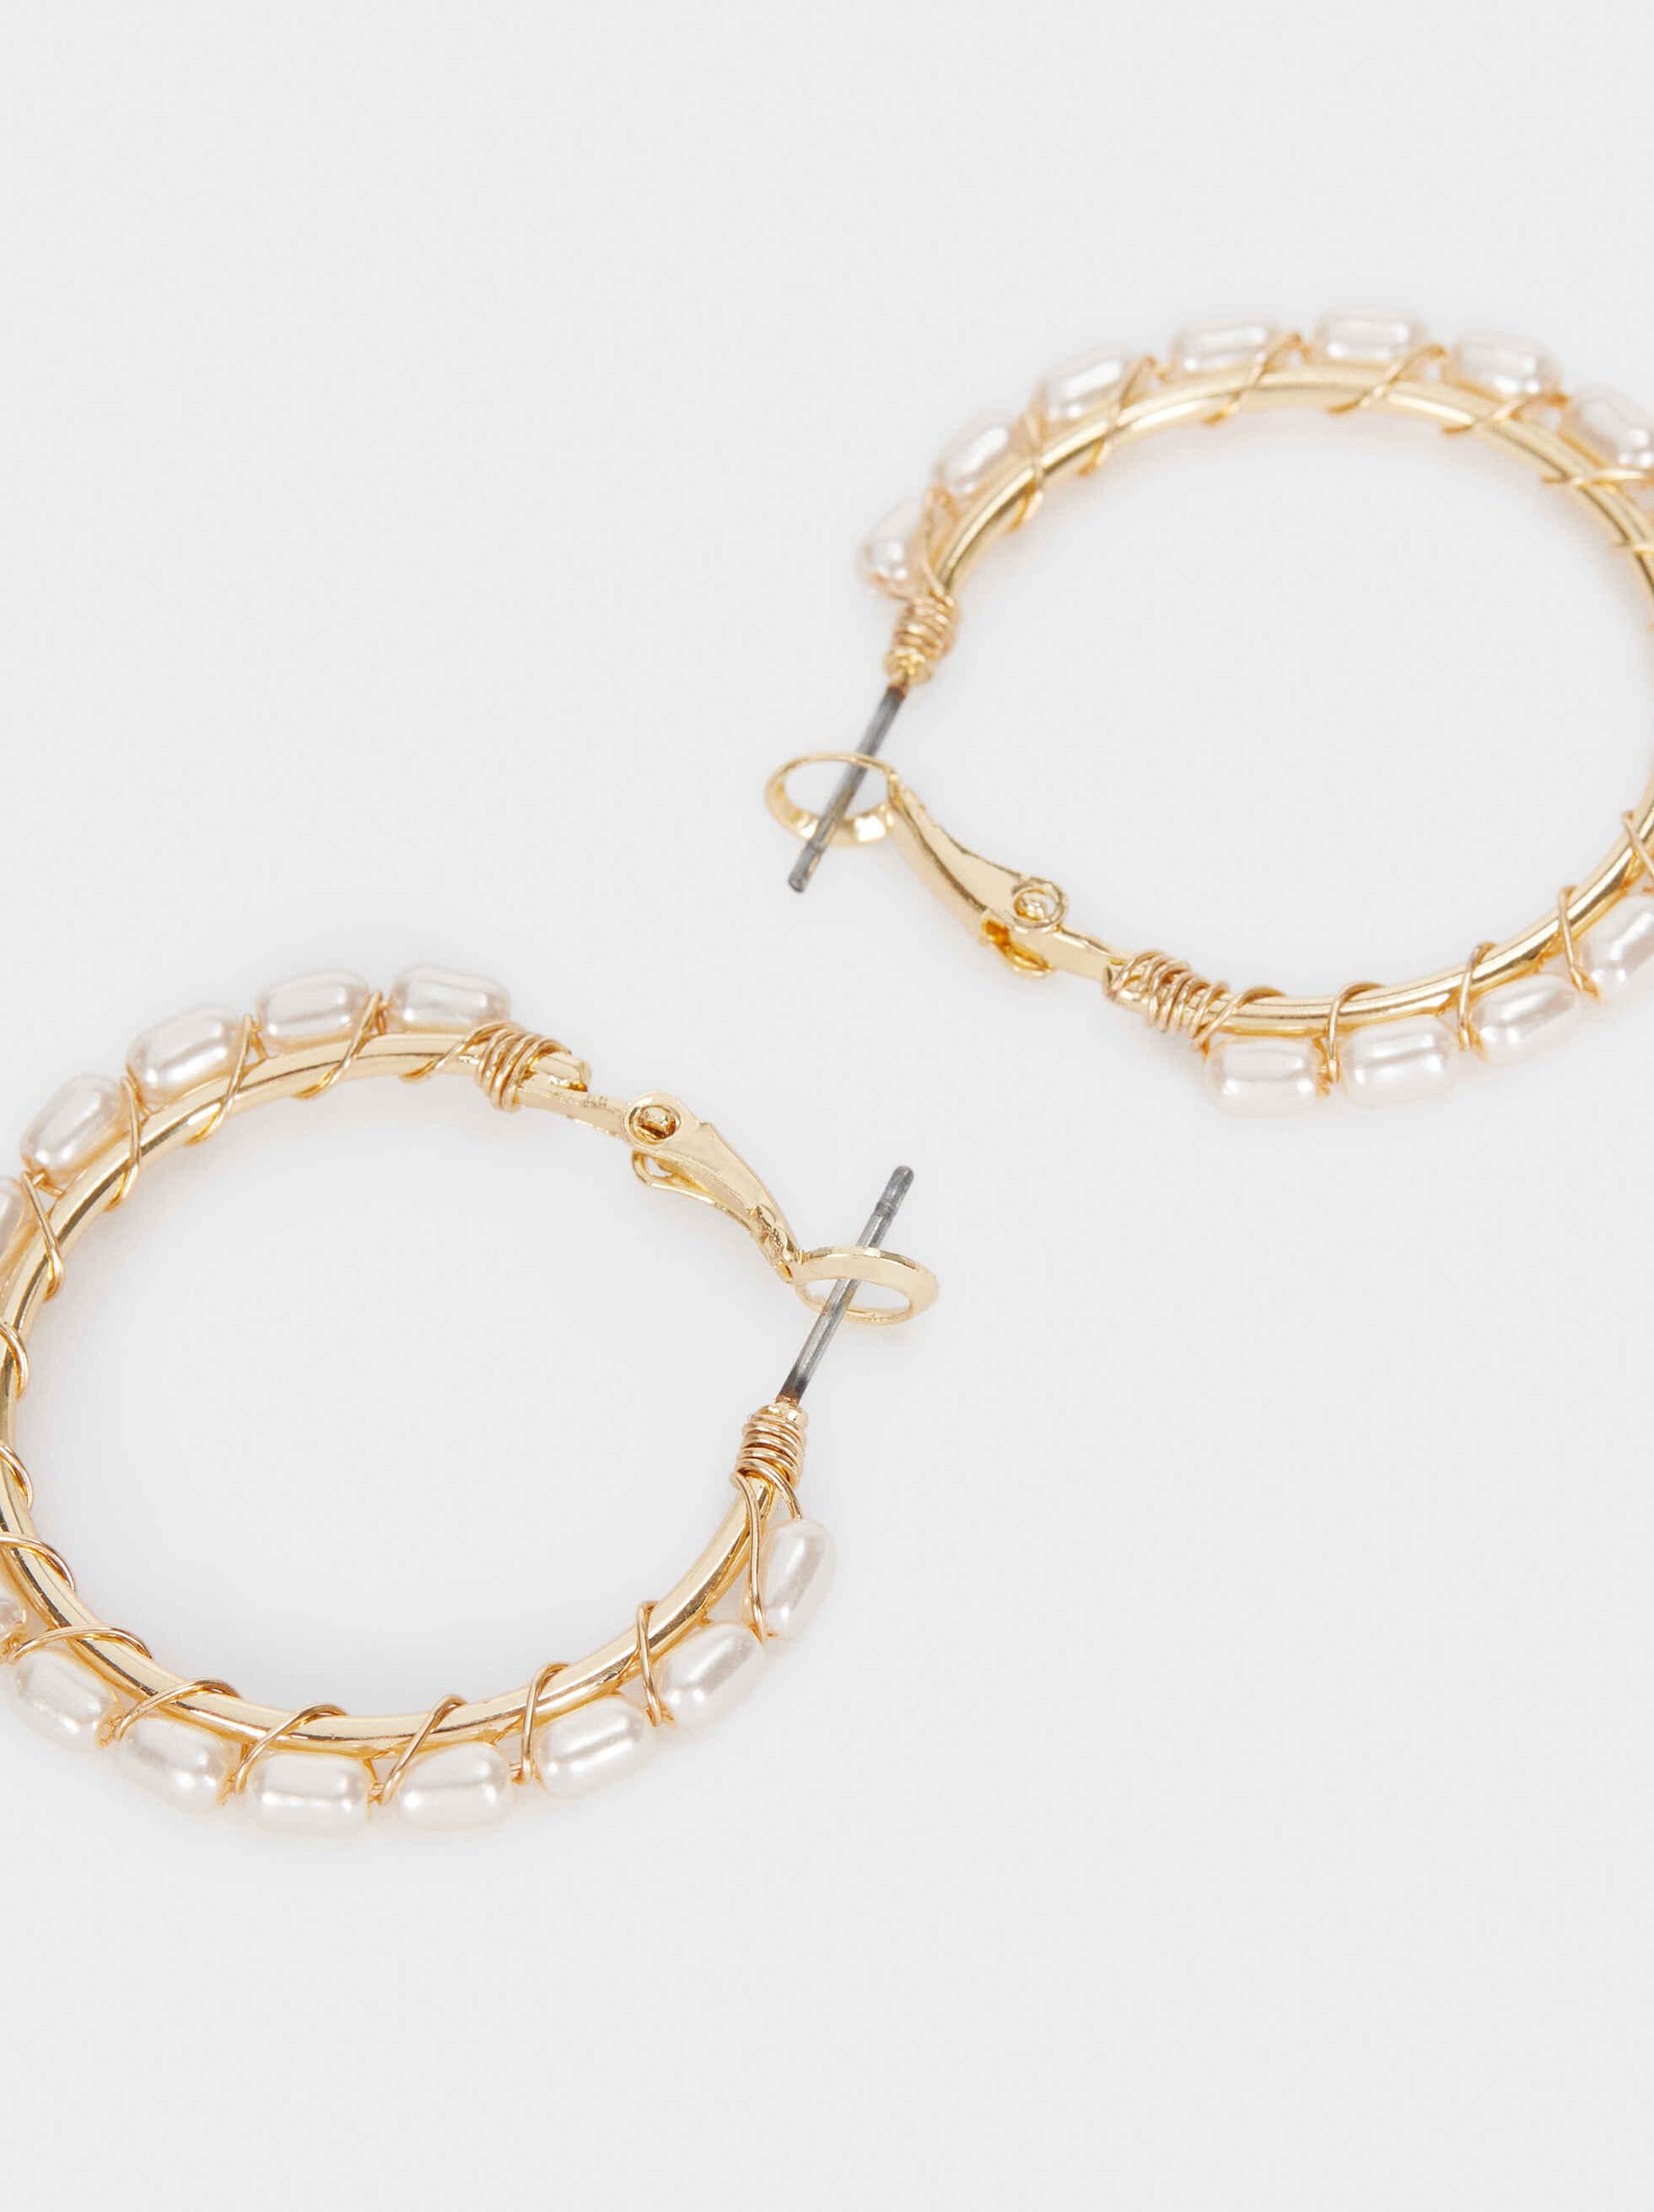 Medium Gold Hoop Earrings With Faux Pearl Detail, Golden, hi-res